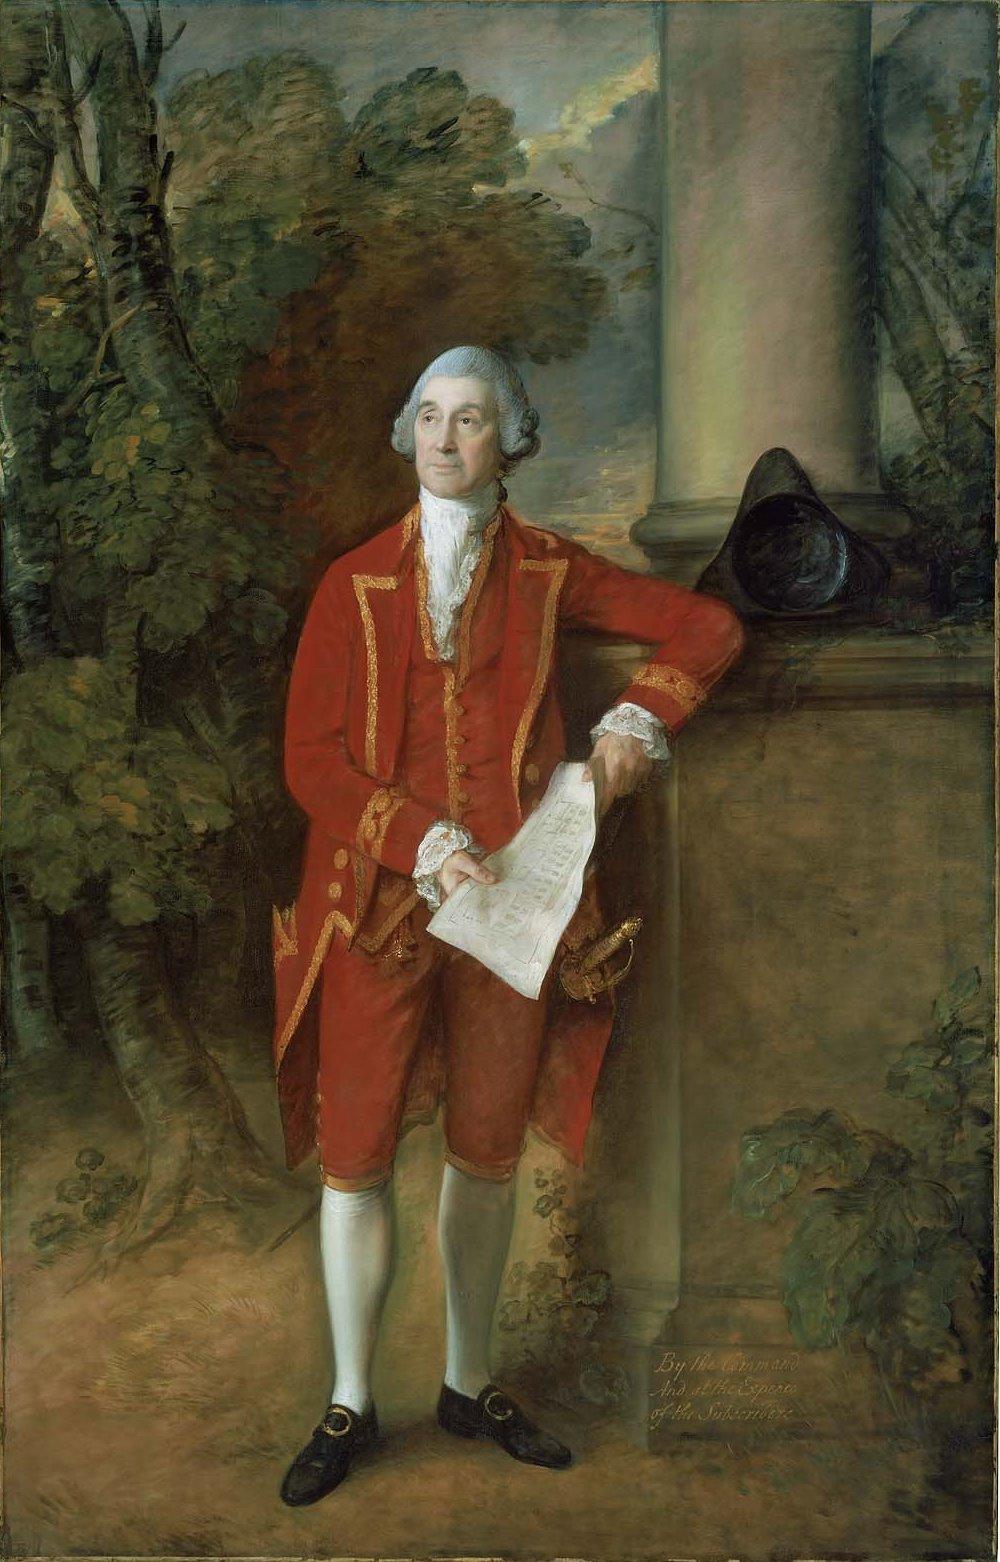 Thomas Gainsborough. John And from Safford hall, Stafford